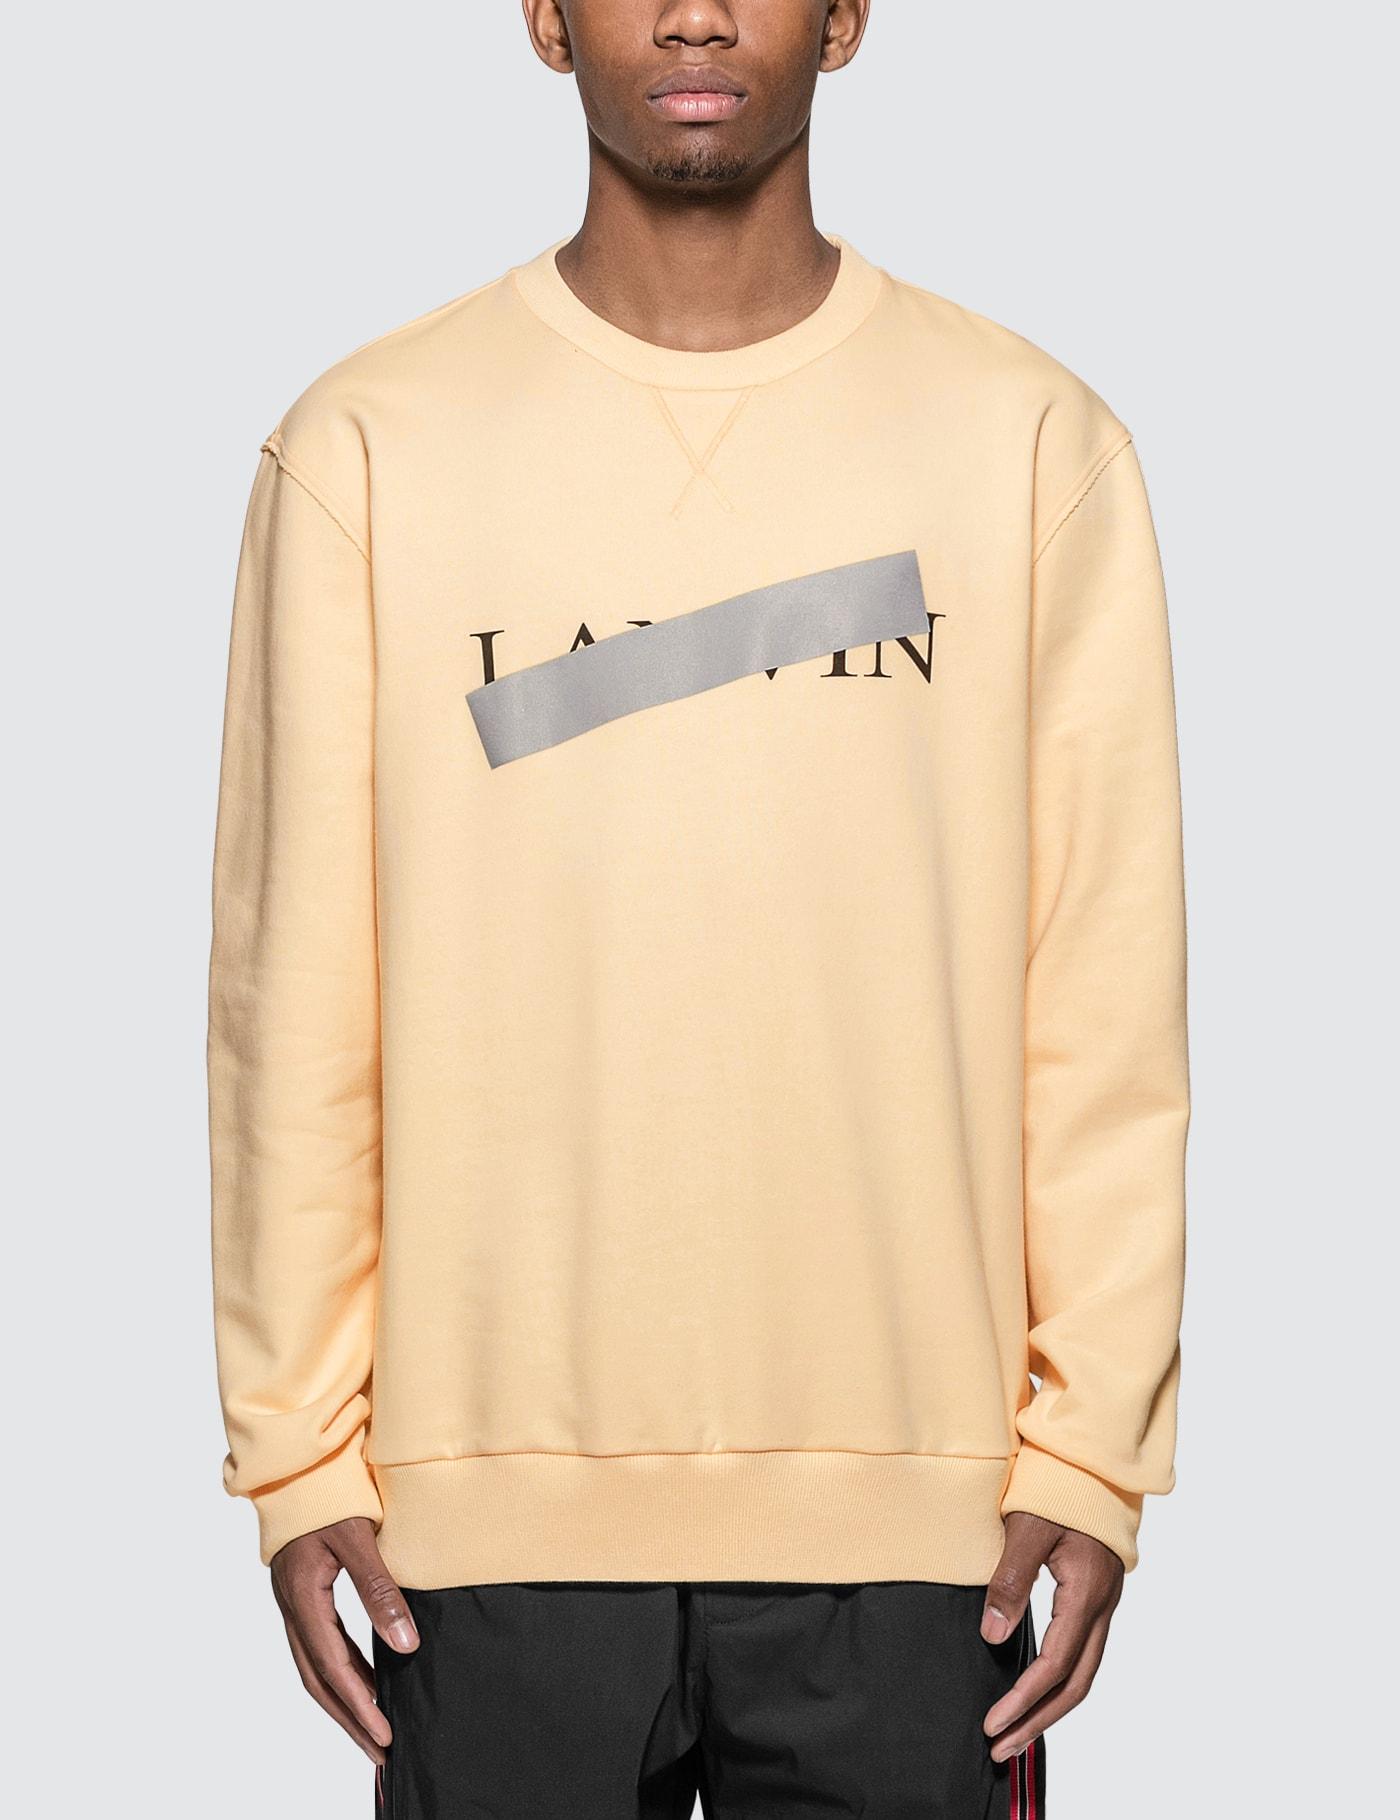 Lanvin Bar Print Sweatshirt